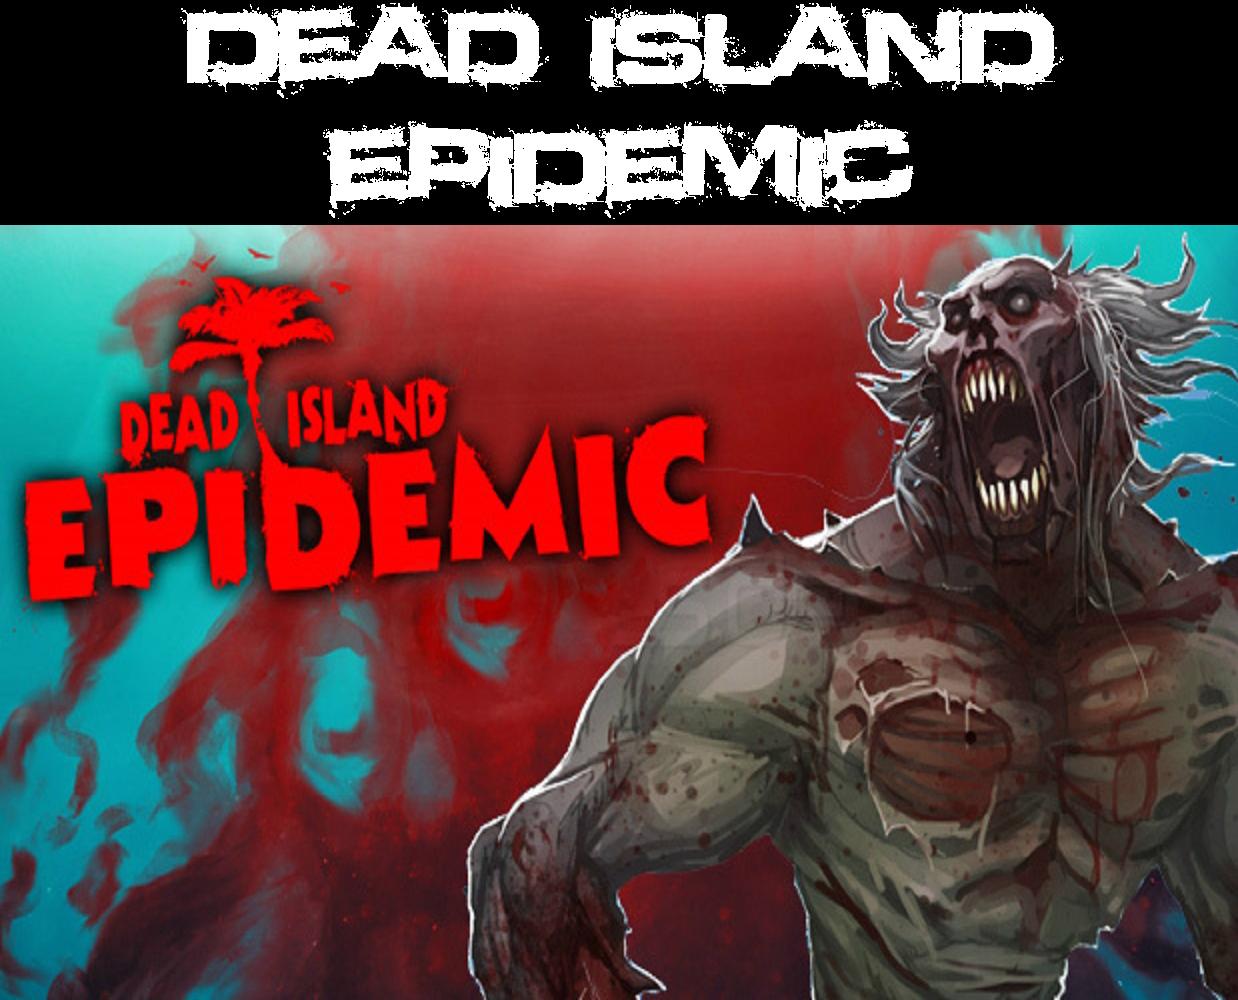 http://radioaktywne-recenzje.blogspot.com/2013/09/dead-island-epidemic.html